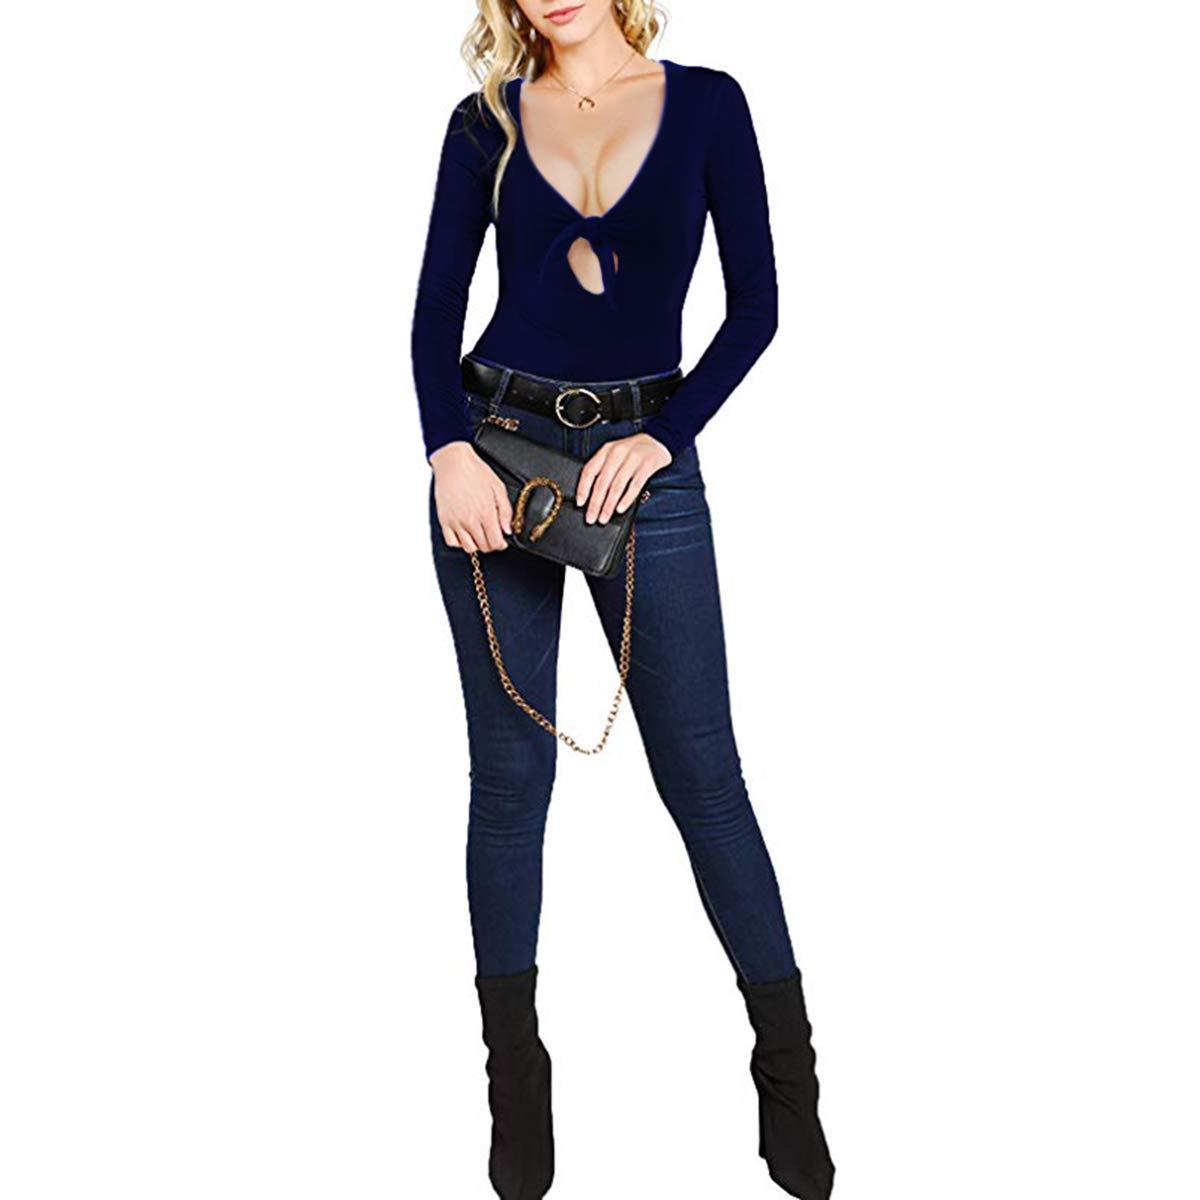 Womens Deep V Neck Bodysuit Long Sleeve Elastic Jumpsuit Tops